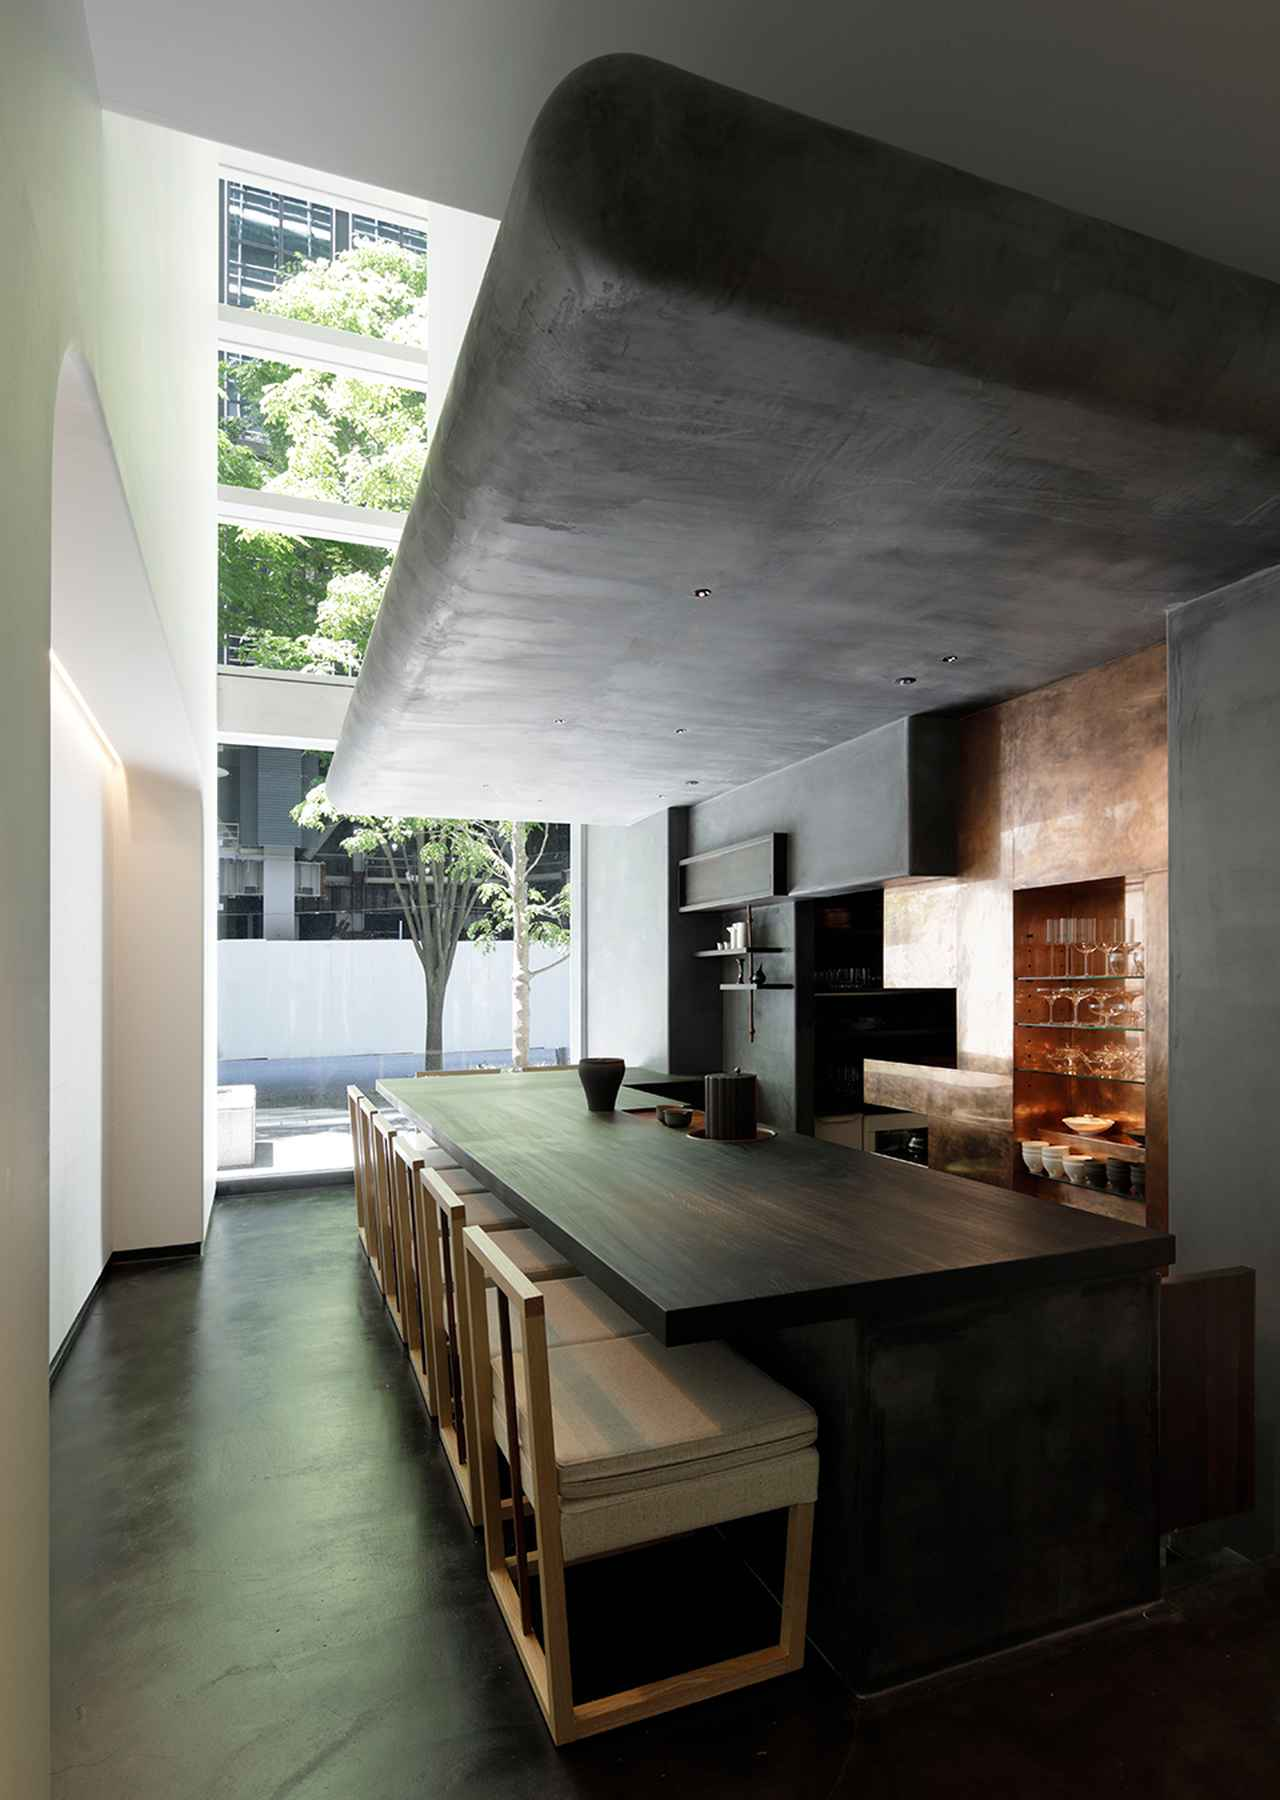 Images : 「HIGASHIYA man 丸の内」の茶房